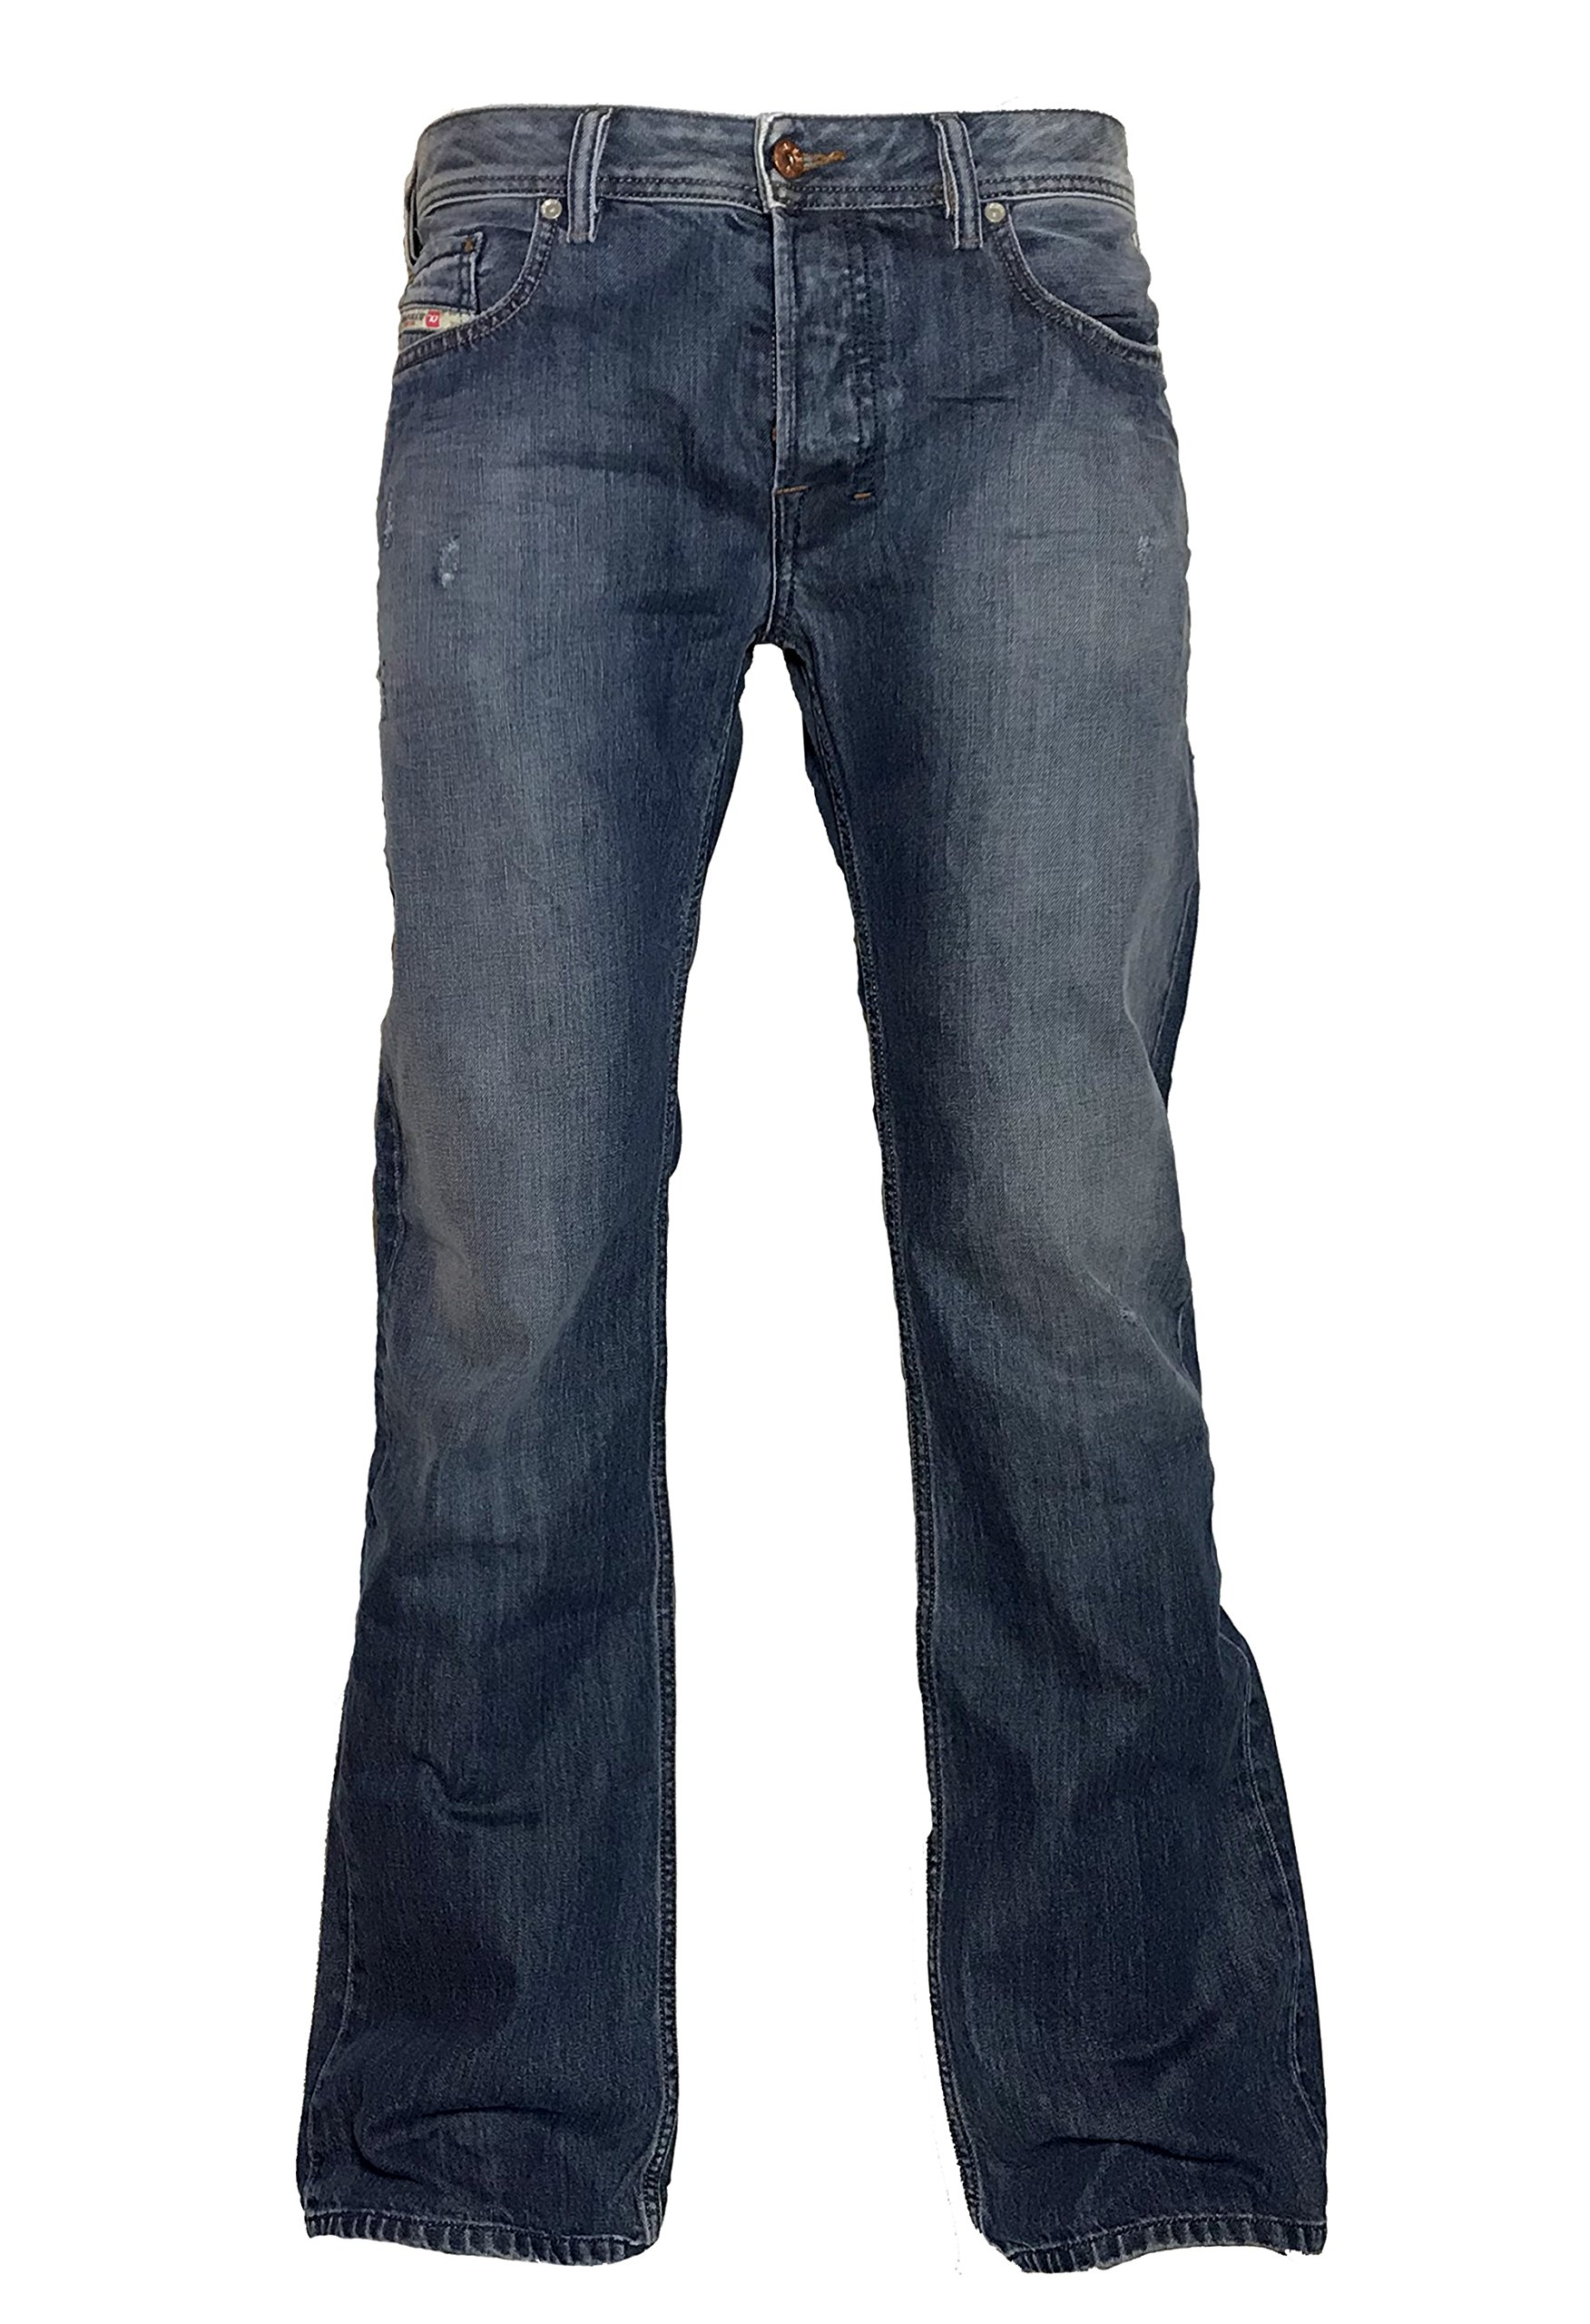 Diesel Mens Boot-Cut Jeans Zatiny 0844U Darkblue used Look (34/32)